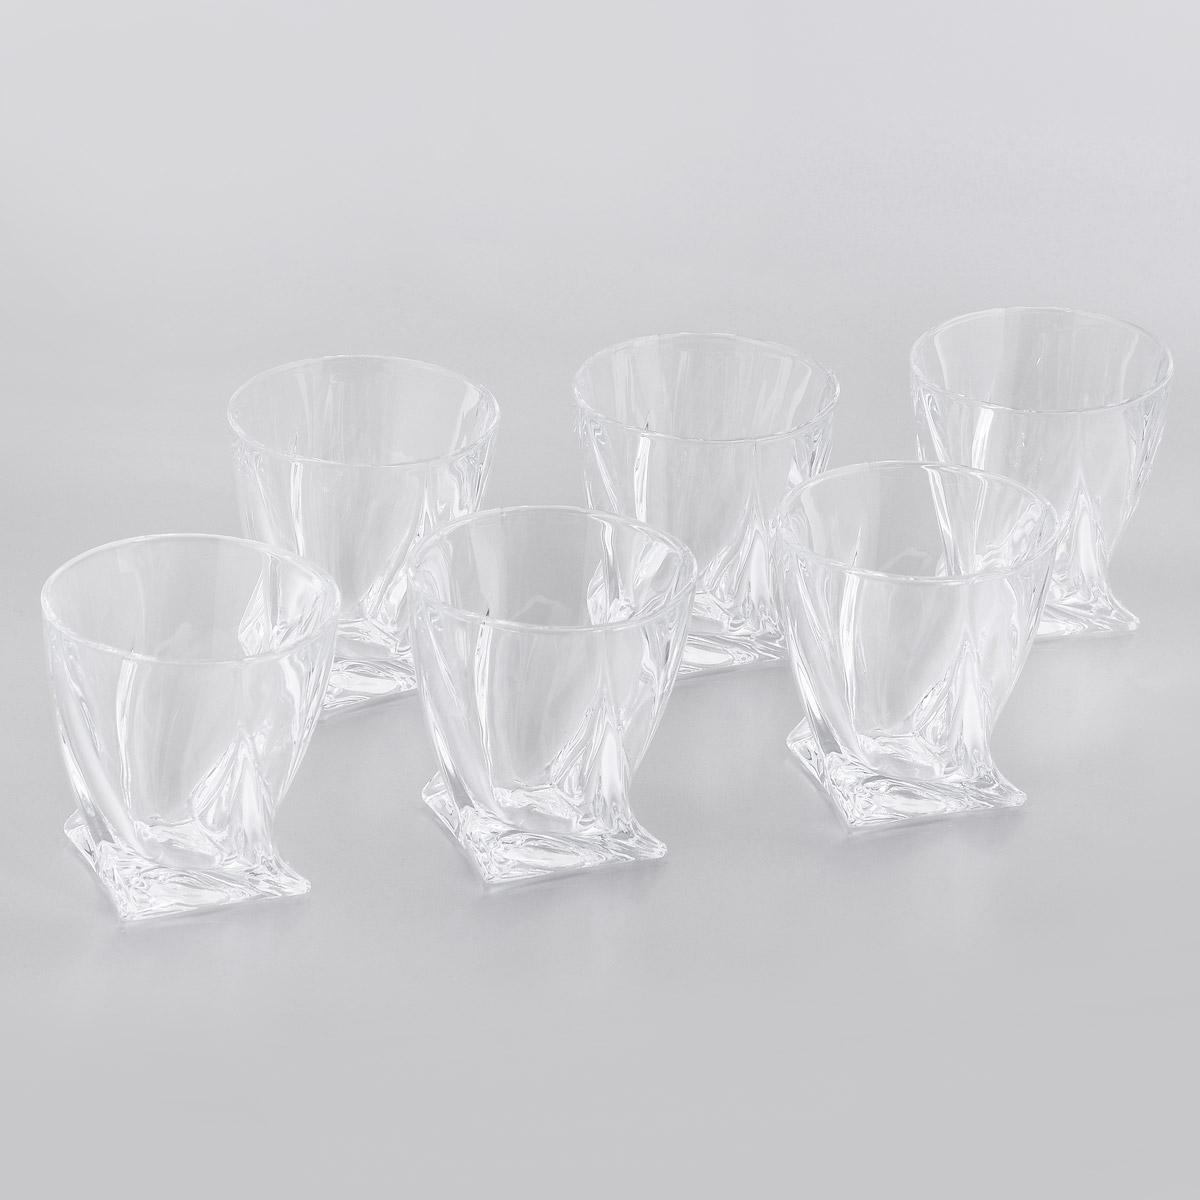 цена на Набор стаканов для виски Crystalite Bohemia Квадро, 340 мл, 6 шт